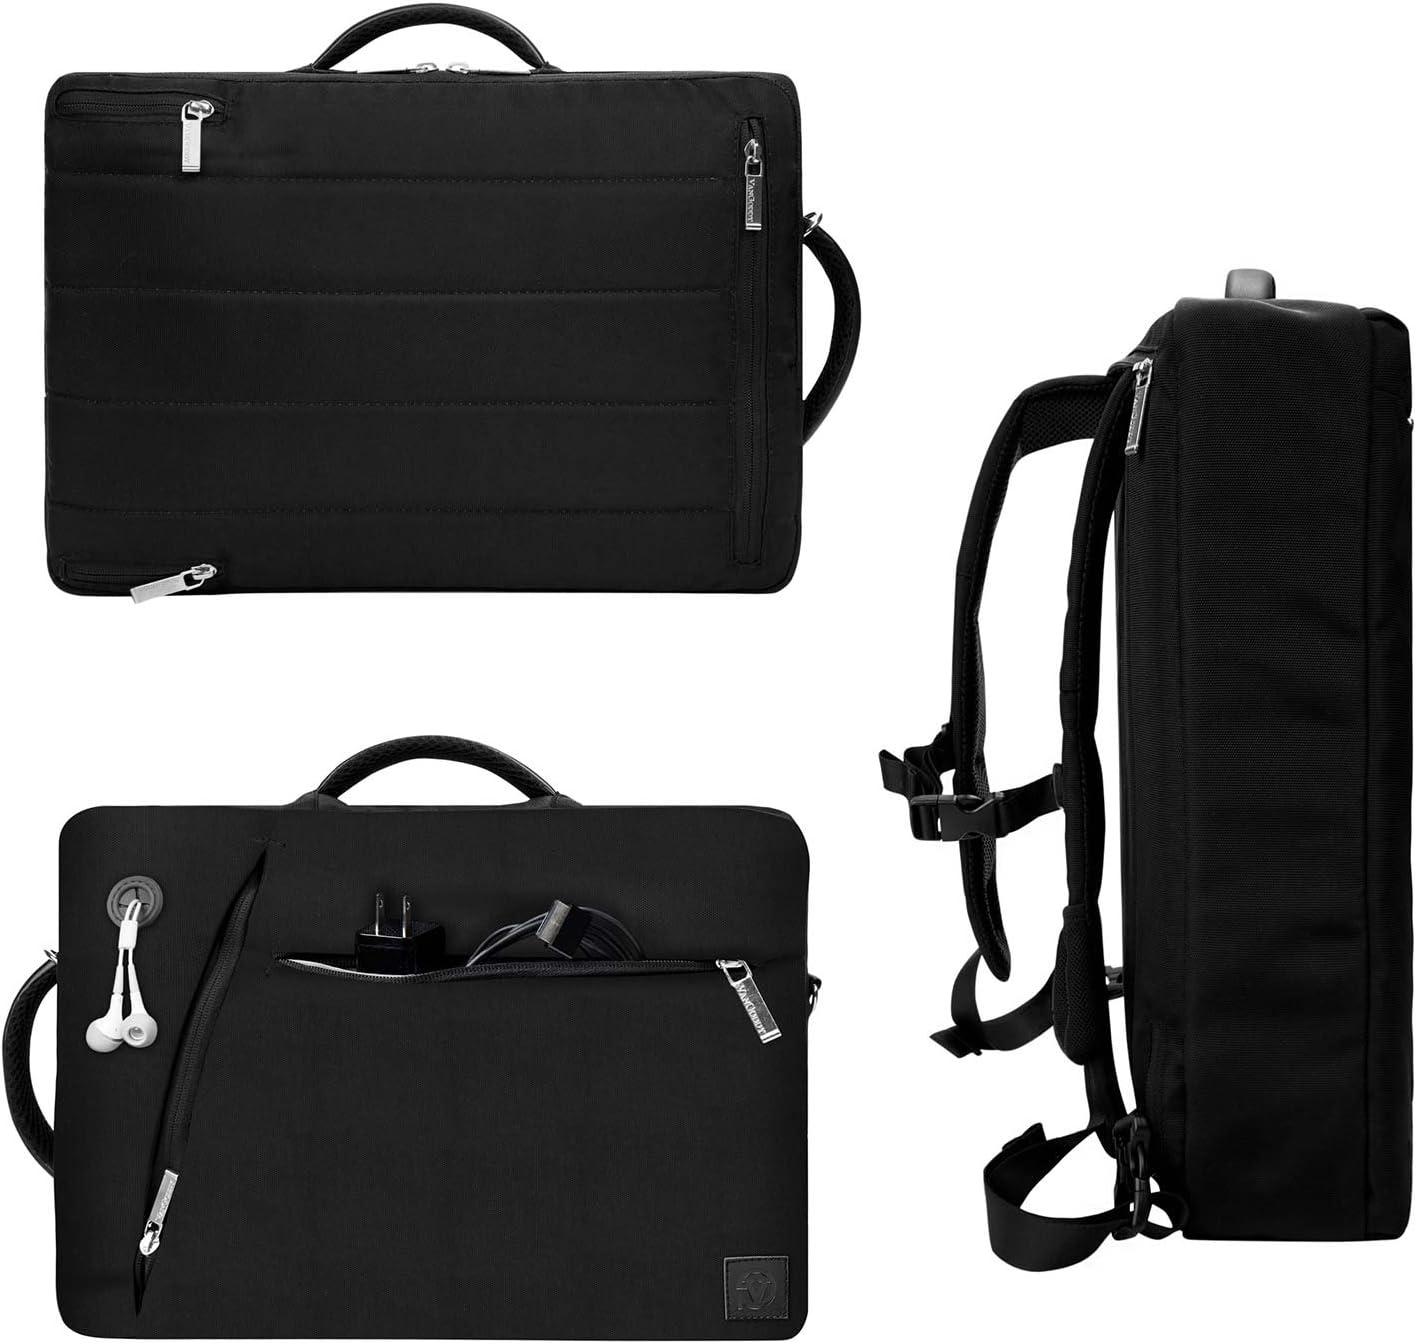 Vangoddy Waterproof Business Backpack Messenger Bag Briefcase for MSI 15.6 inch Laptop Grey